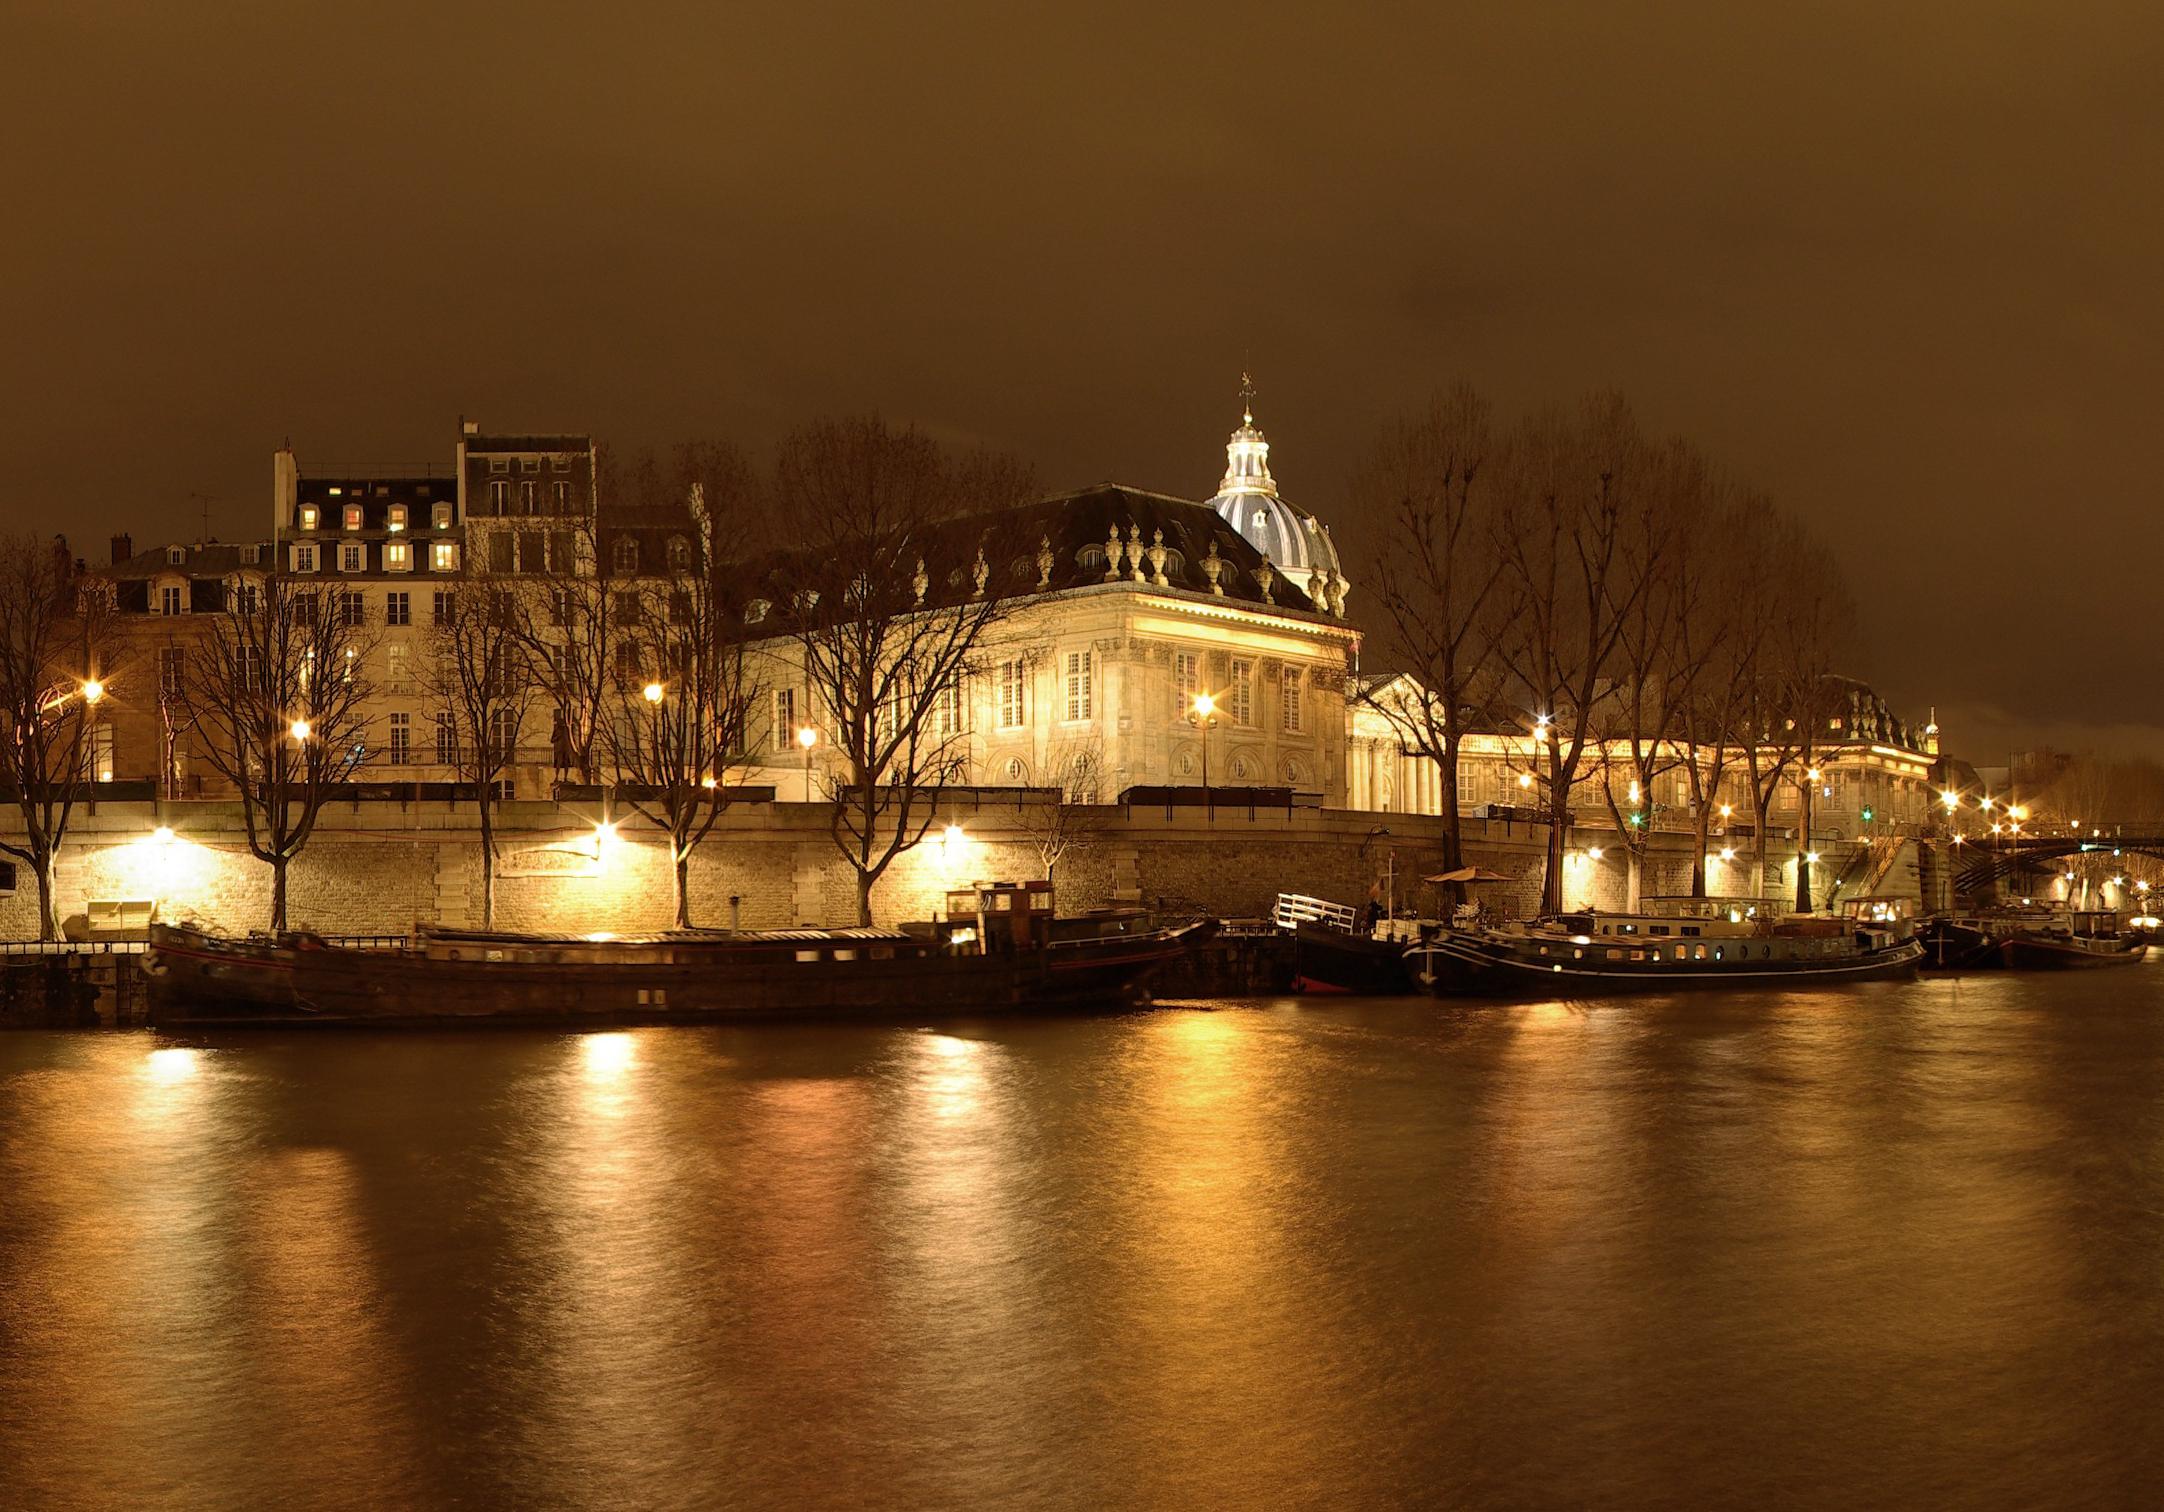 2cv paris tour paris city tours in a 2cv sightseeing tours and paris by night grand 2cv. Black Bedroom Furniture Sets. Home Design Ideas